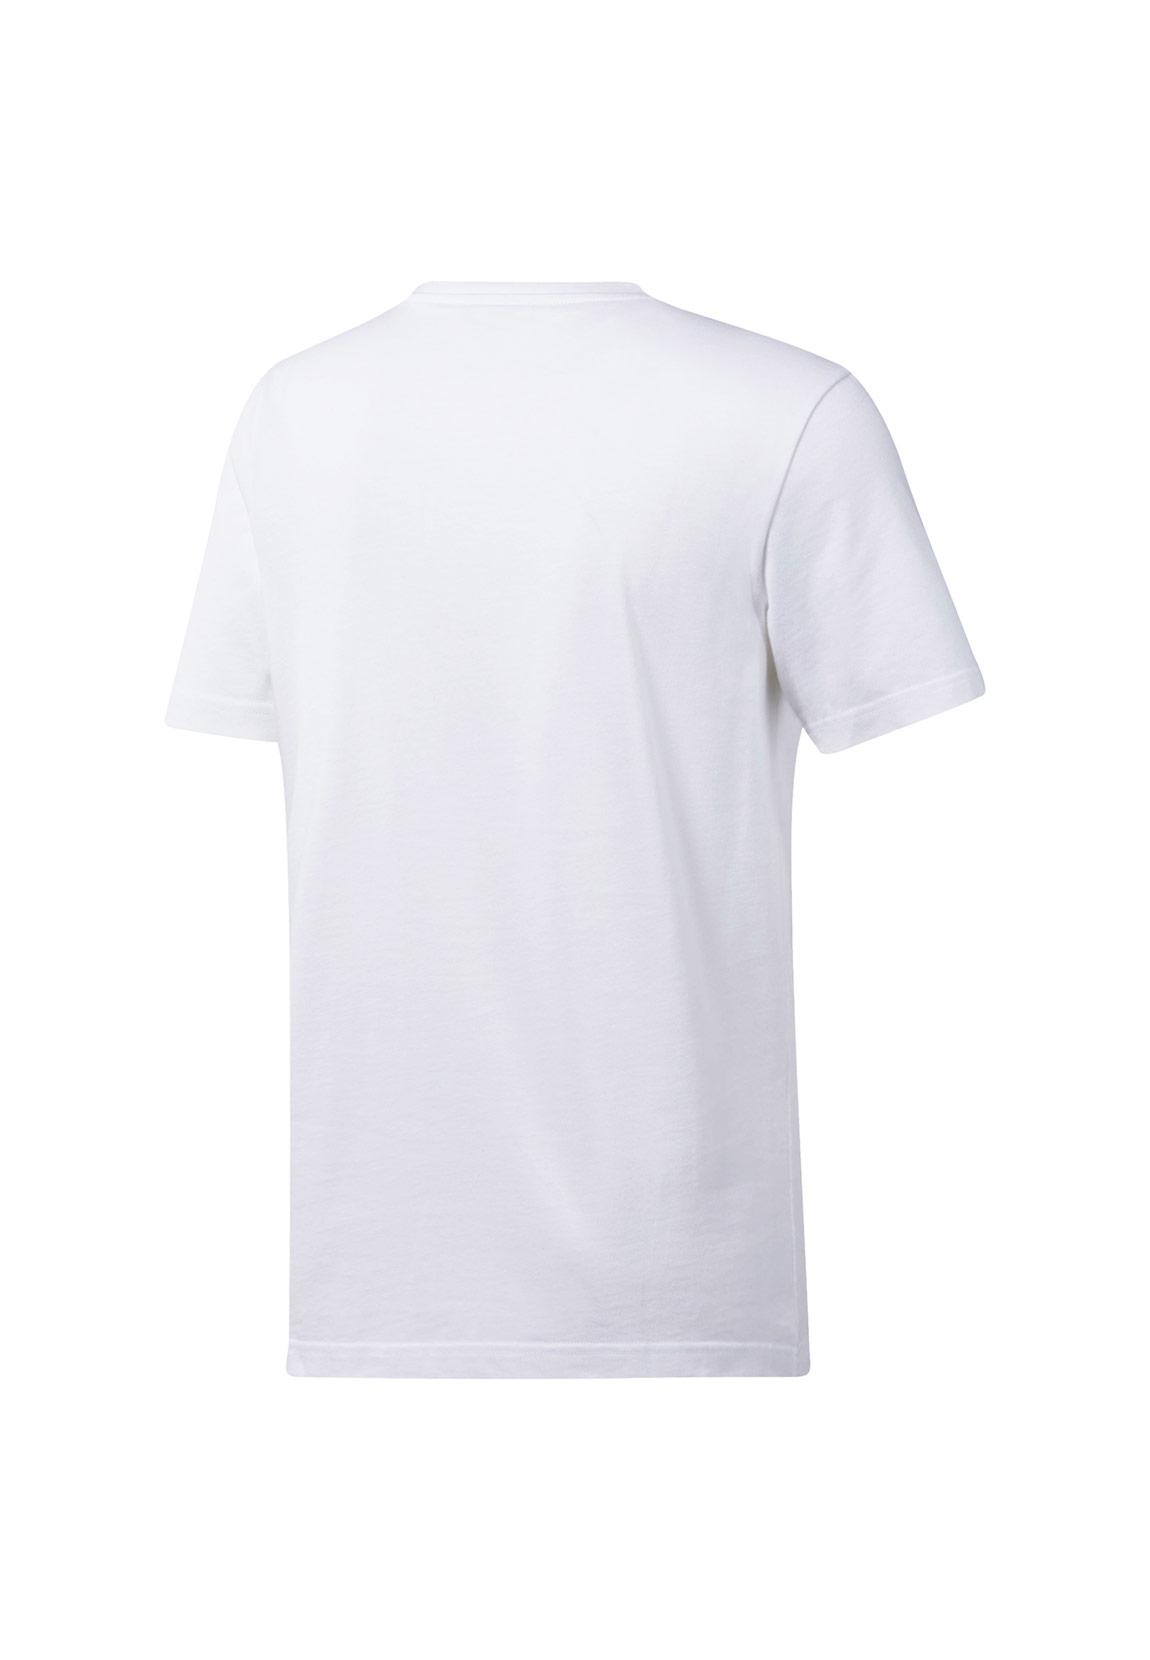 Reebok T Shirt Herren CL V TEE DX3818 Weiß